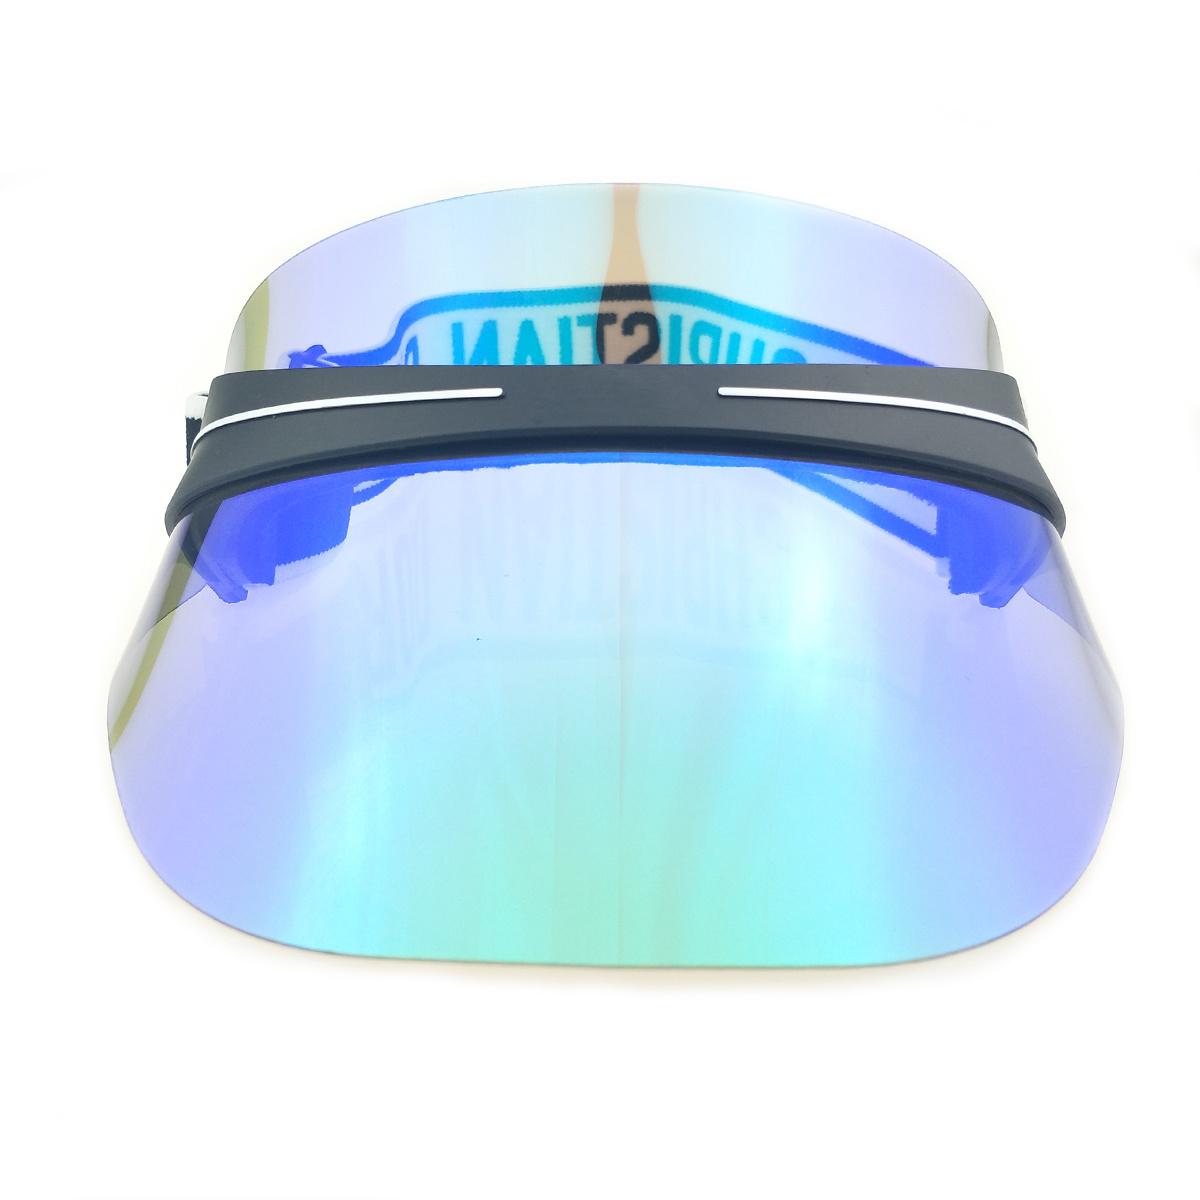 288b8b7b2069b New Design Fashion Wholesale Waterproof UV Protection Custom Plastic Sun  Flat Long Bill Visor Cap Hat Material